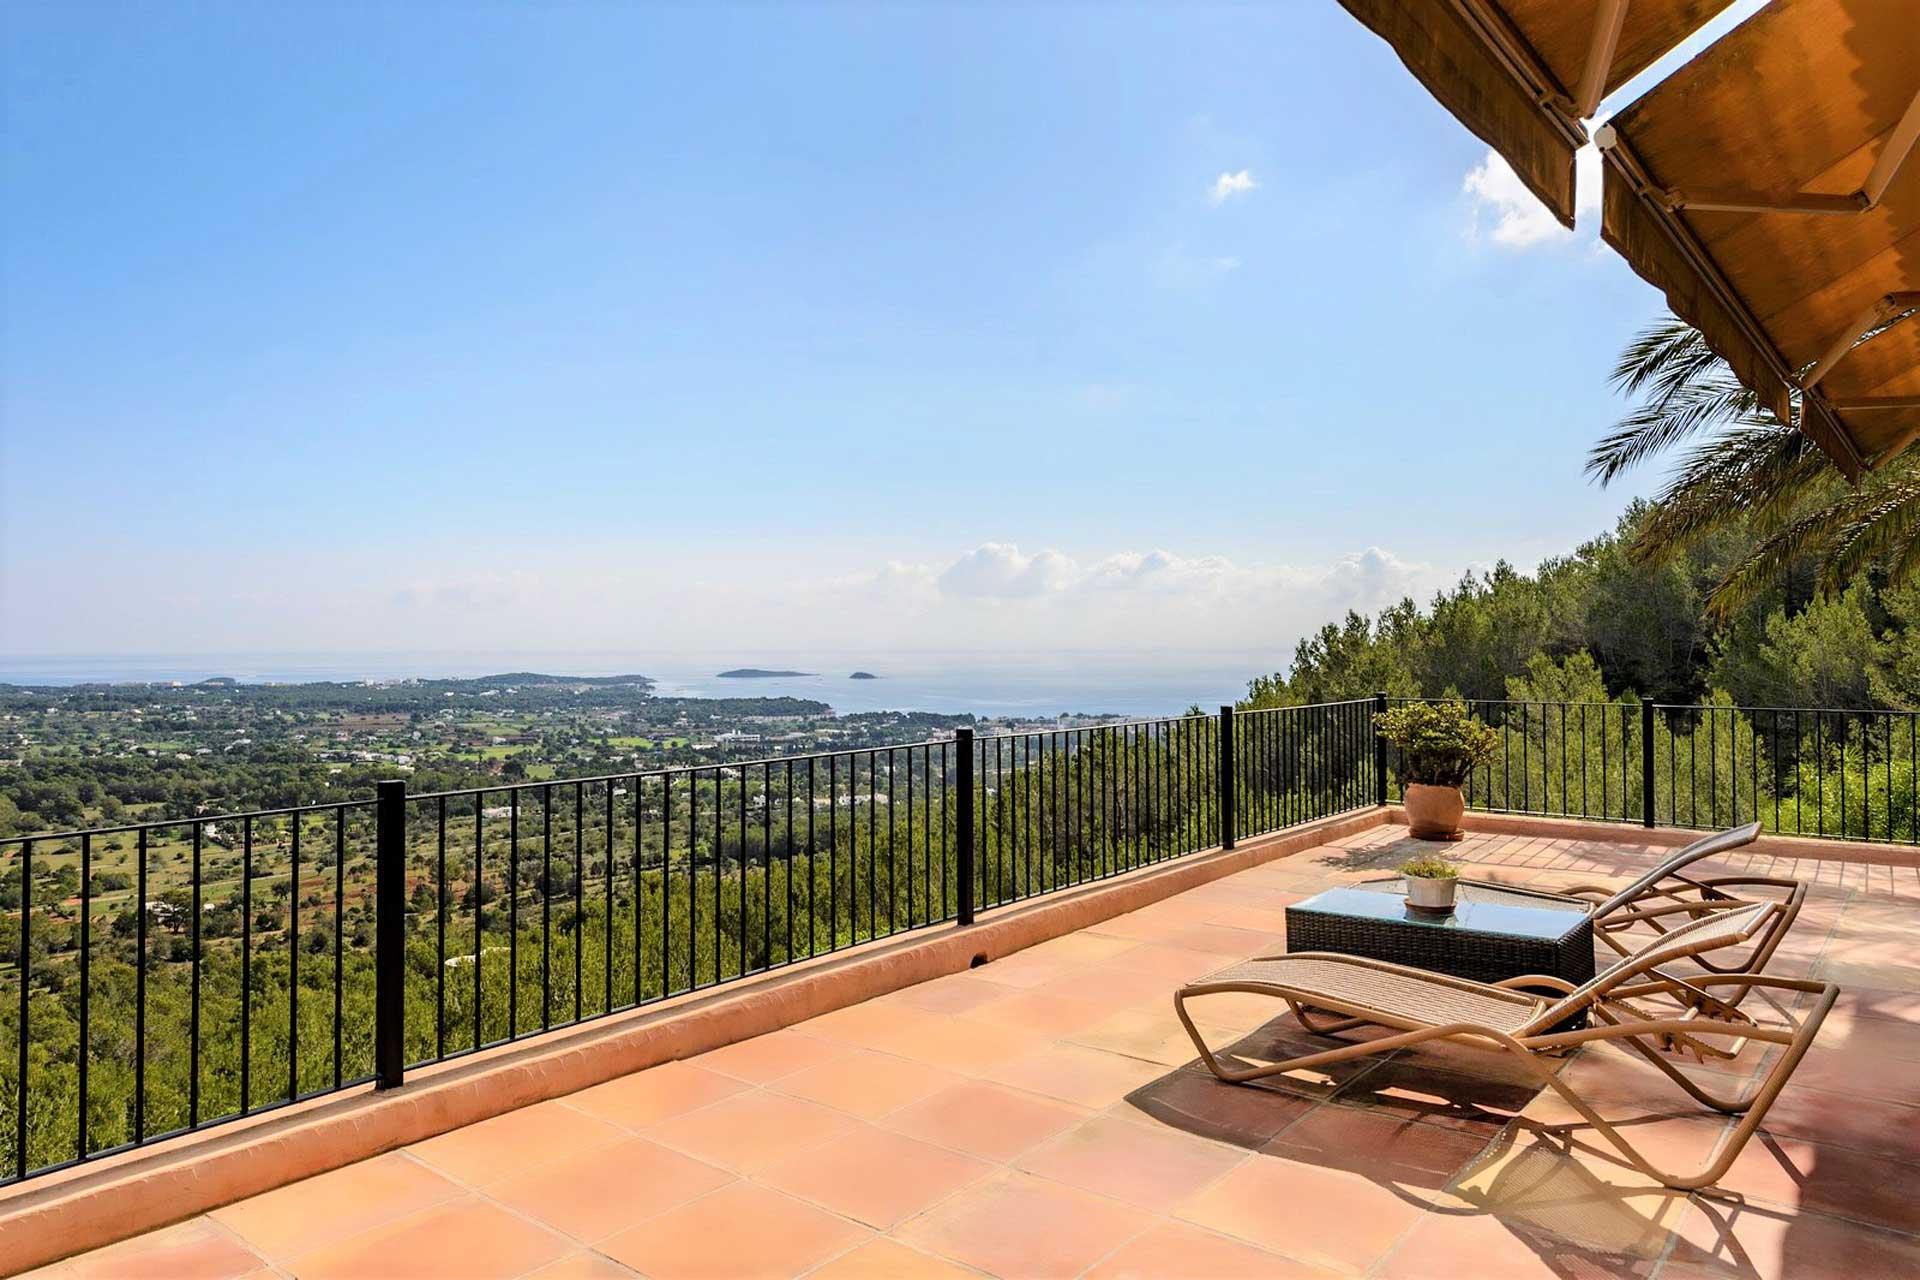 Villa K IBIZA - Master-Suite OG mit privater Terrasse